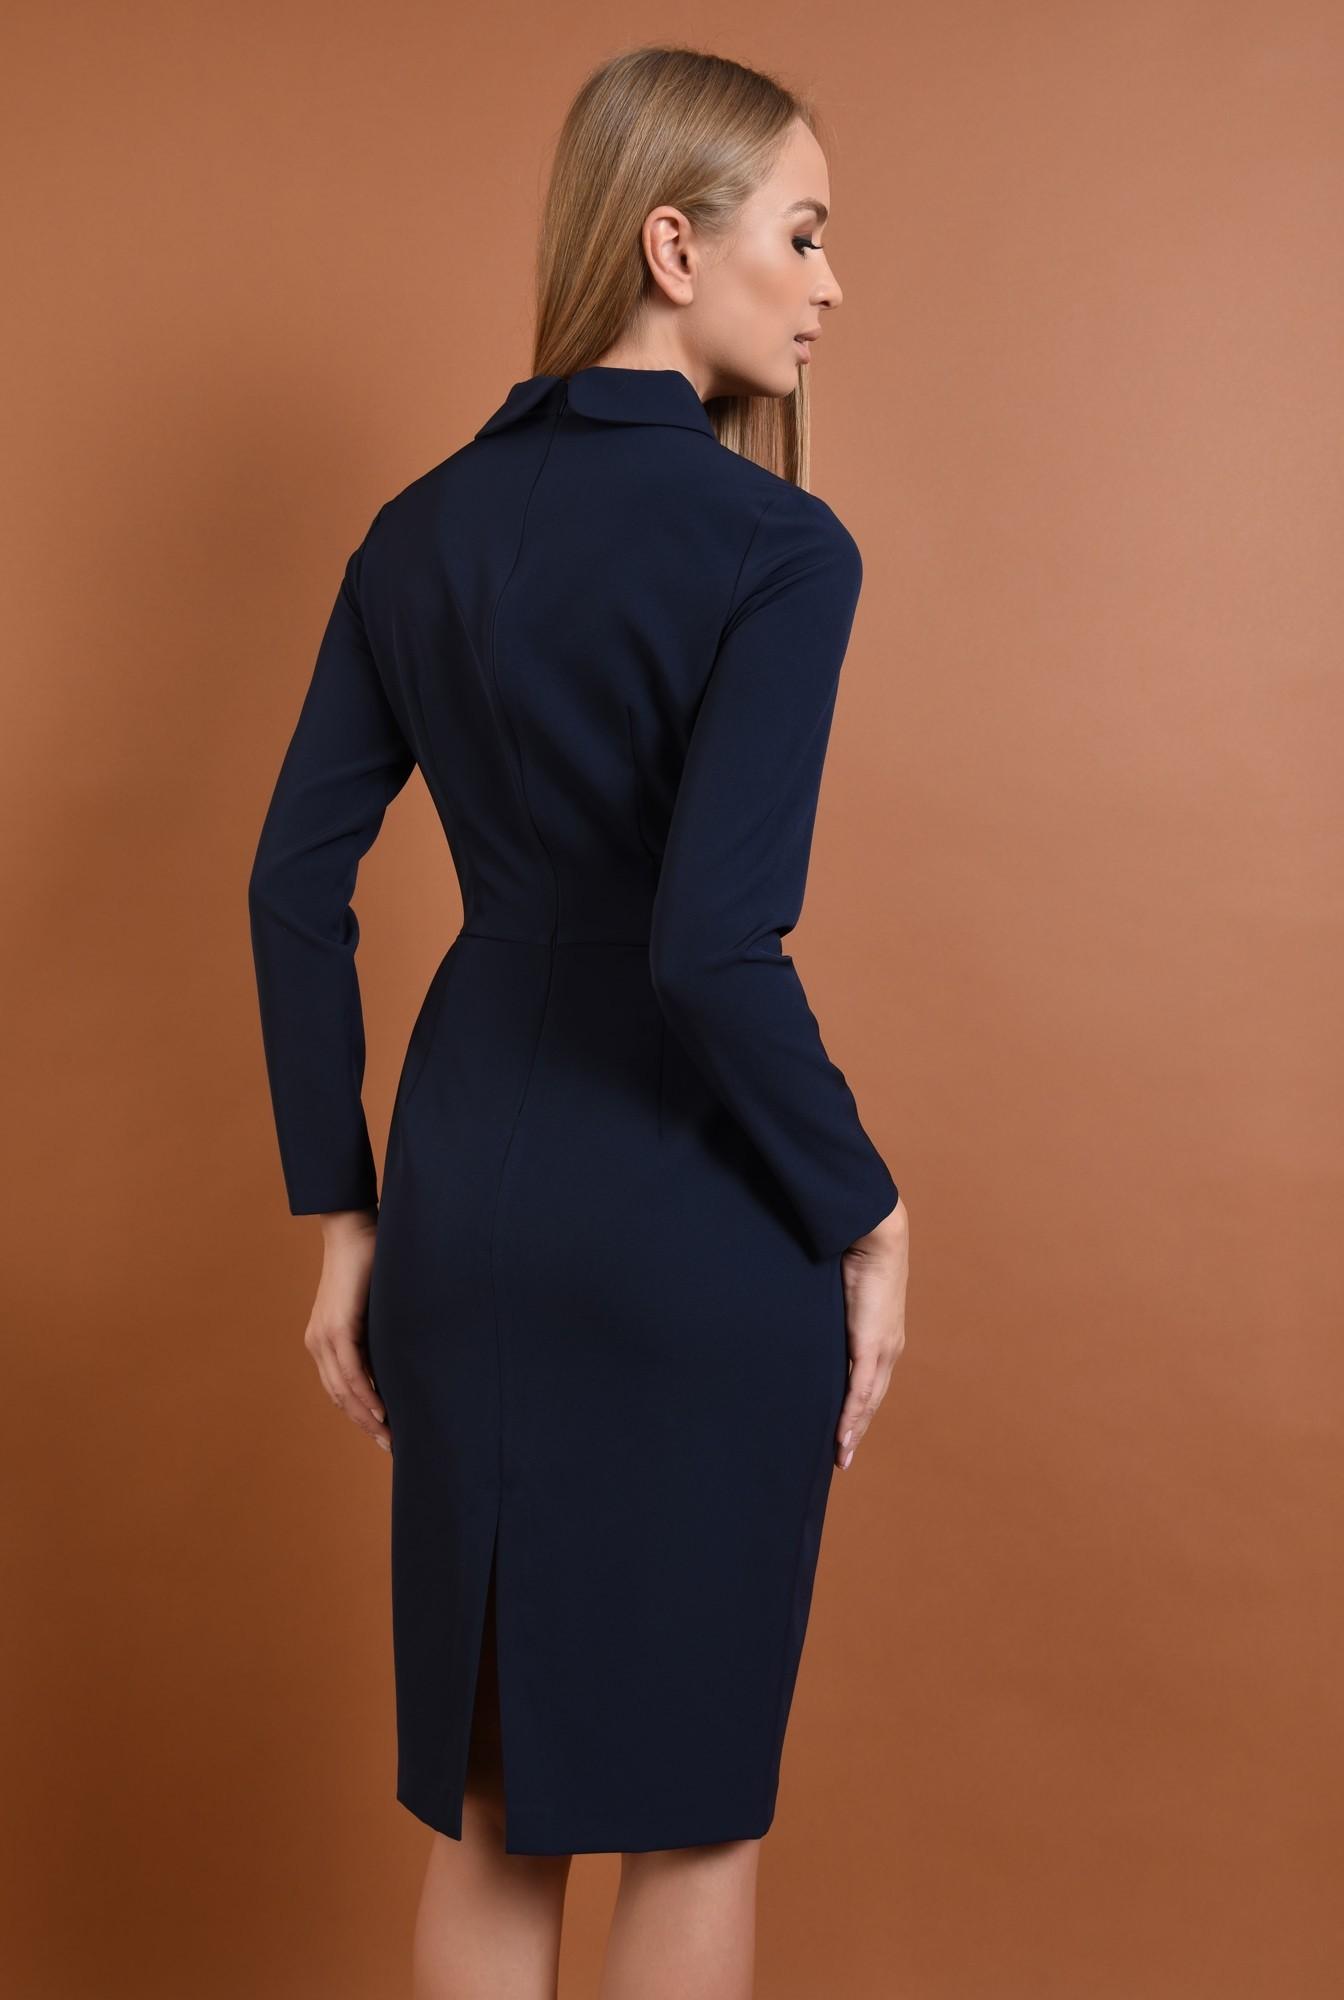 1 - 360 - rochie casual, bleumarin, rochie creion, bodycon, guler rotunjit, funda